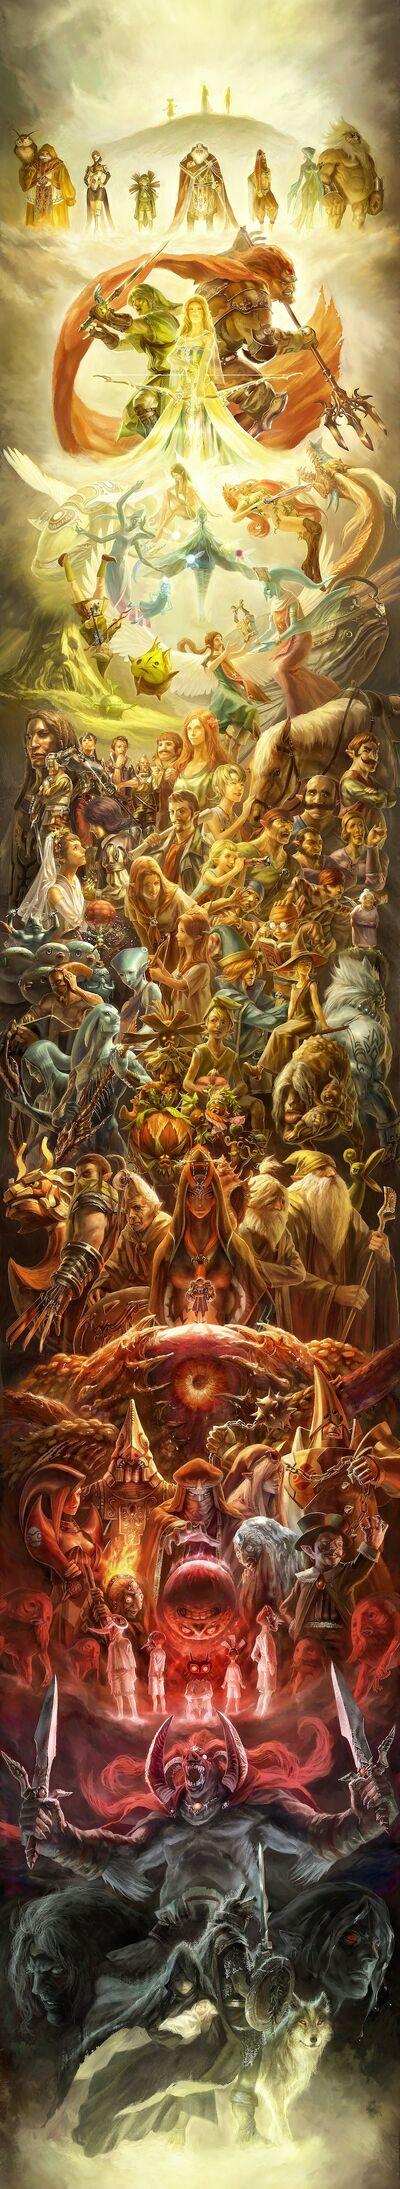 Zelda Collage